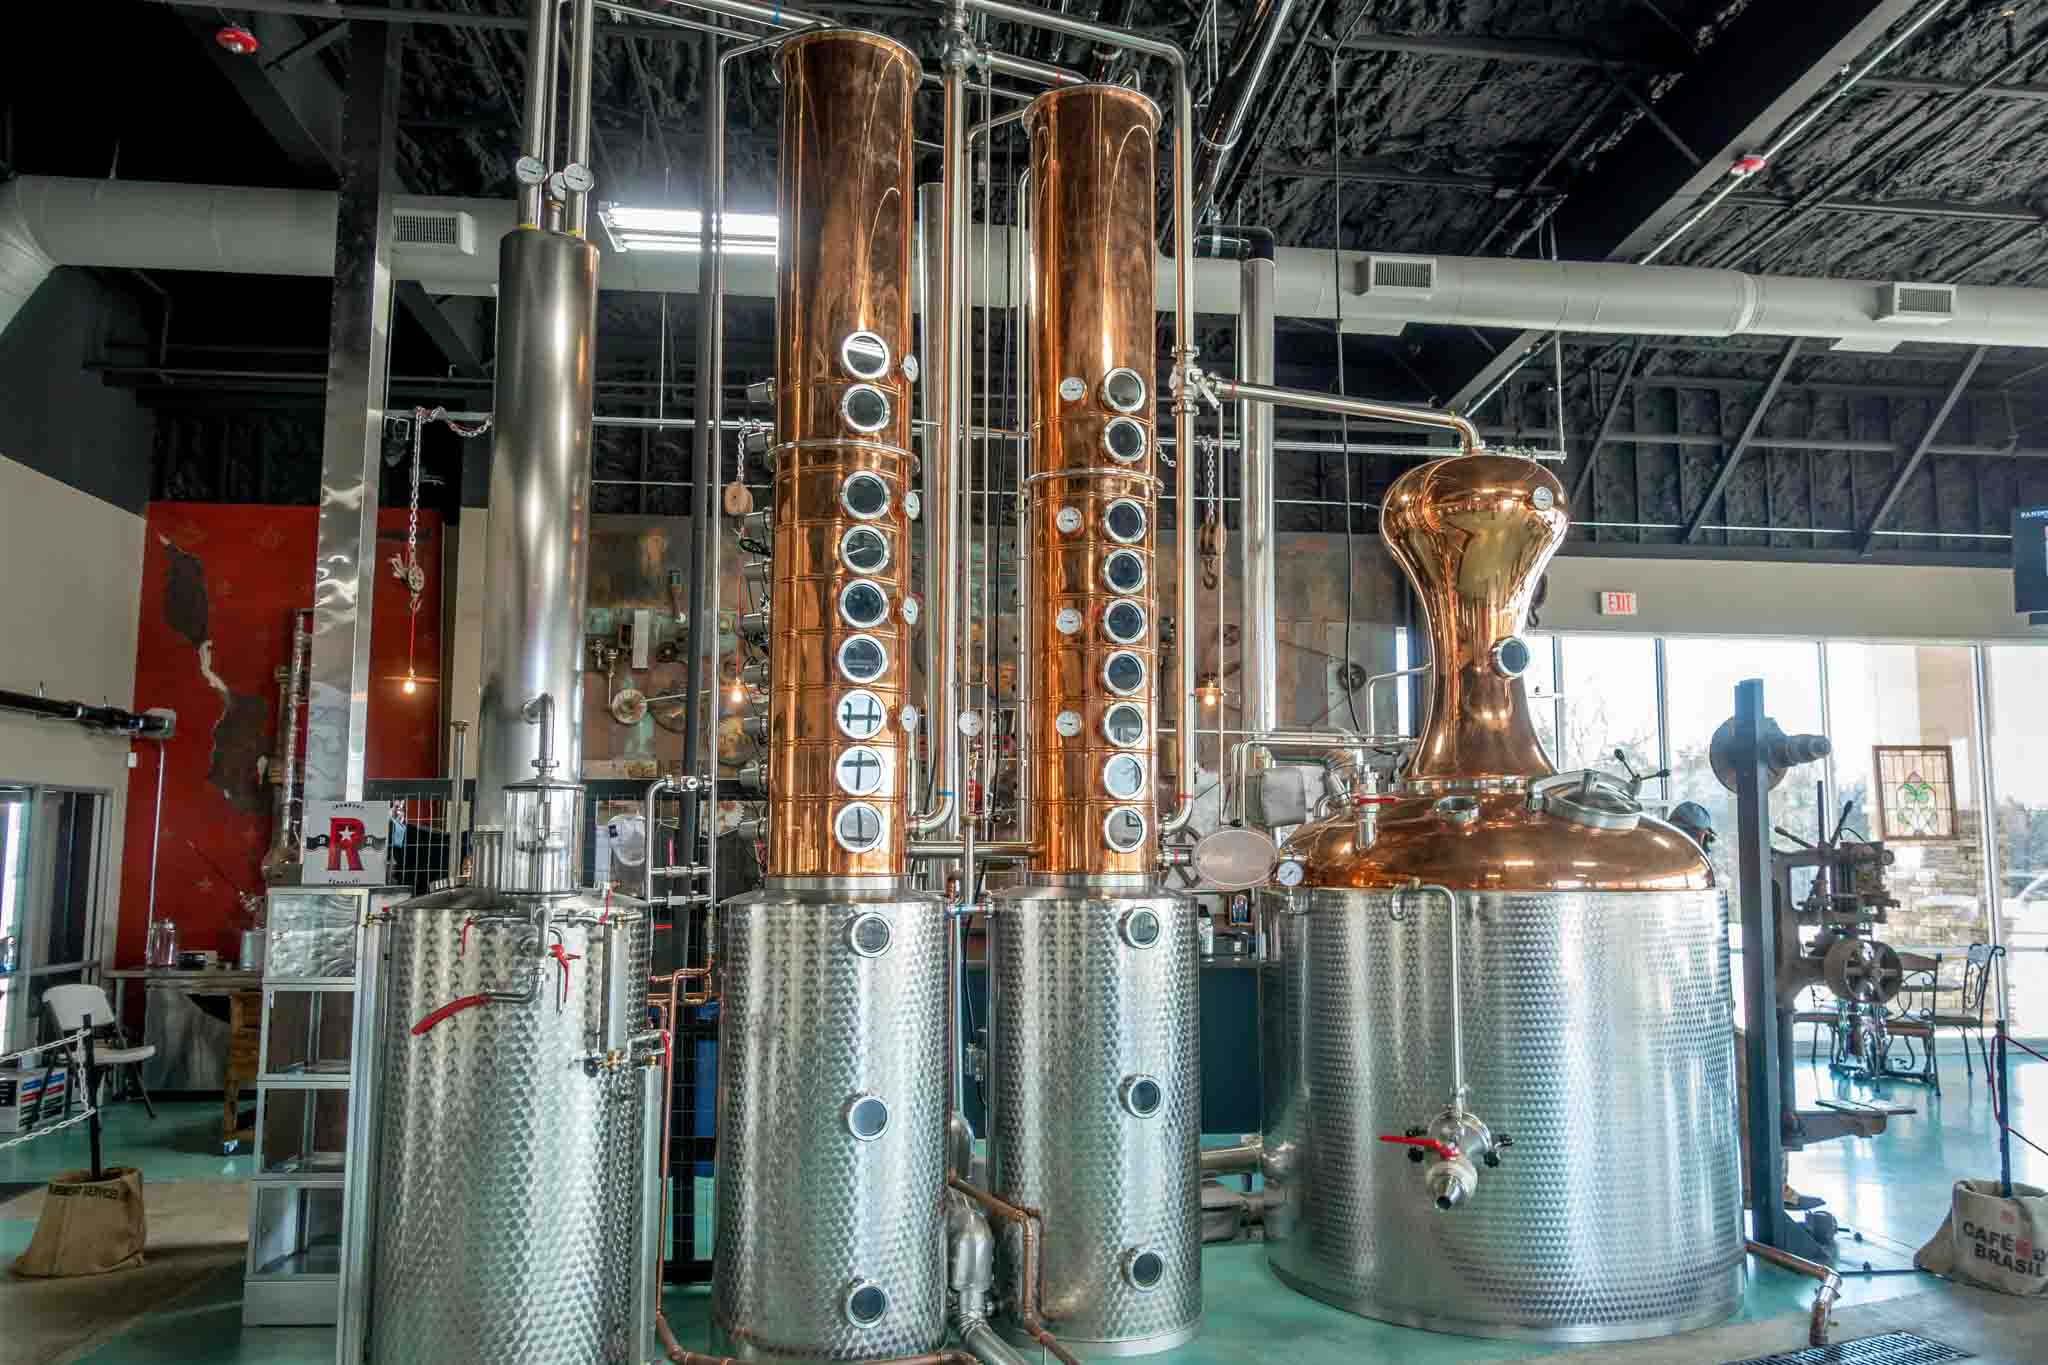 Vodka still at Ironroot Republic, one of the Texas distilleries